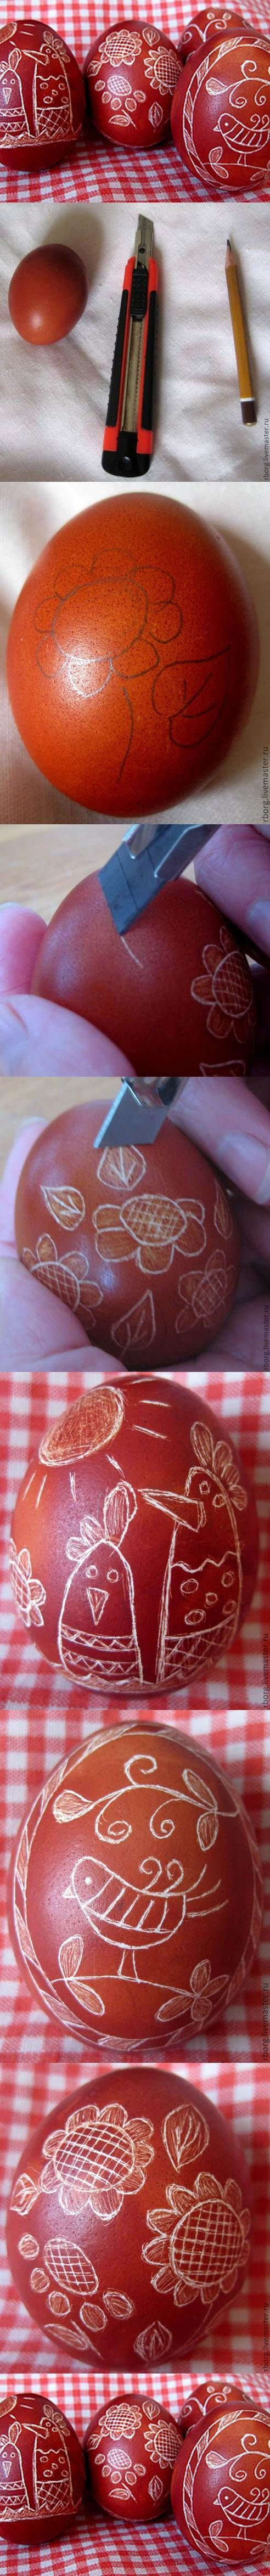 DIY Uniquely Decorated Easter Eggs | iCreativeIdeas.com Like Us on Facebook ==> https://www.facebook.com/icreativeideas